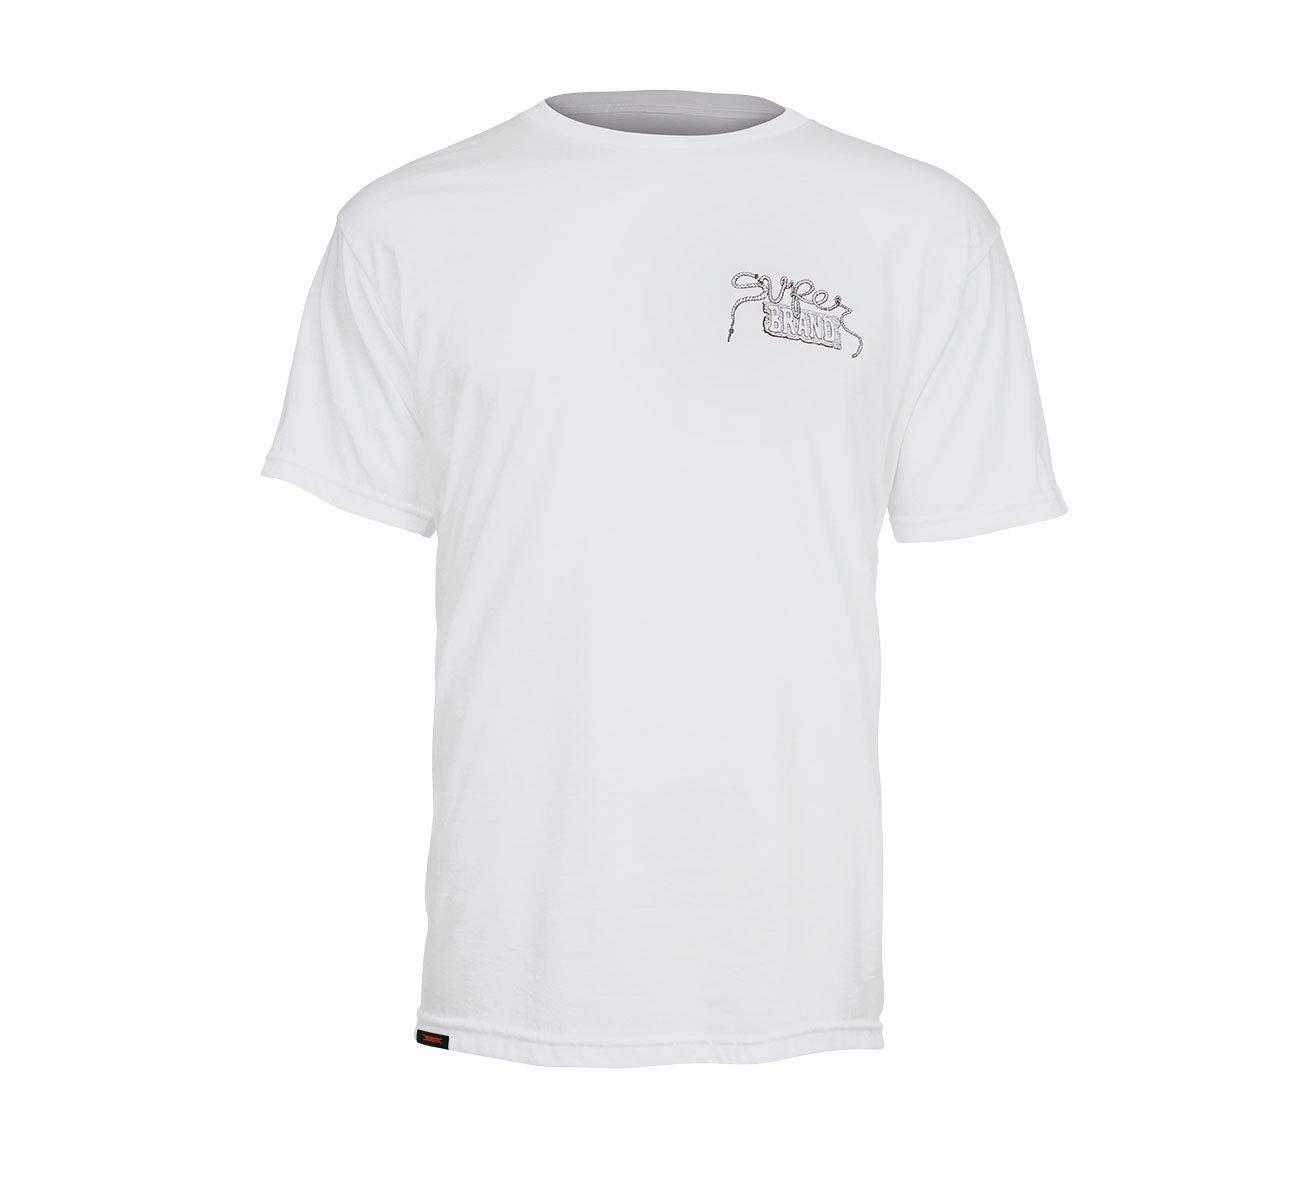 022111169 SUPERbrand Boxed Tee Shirts